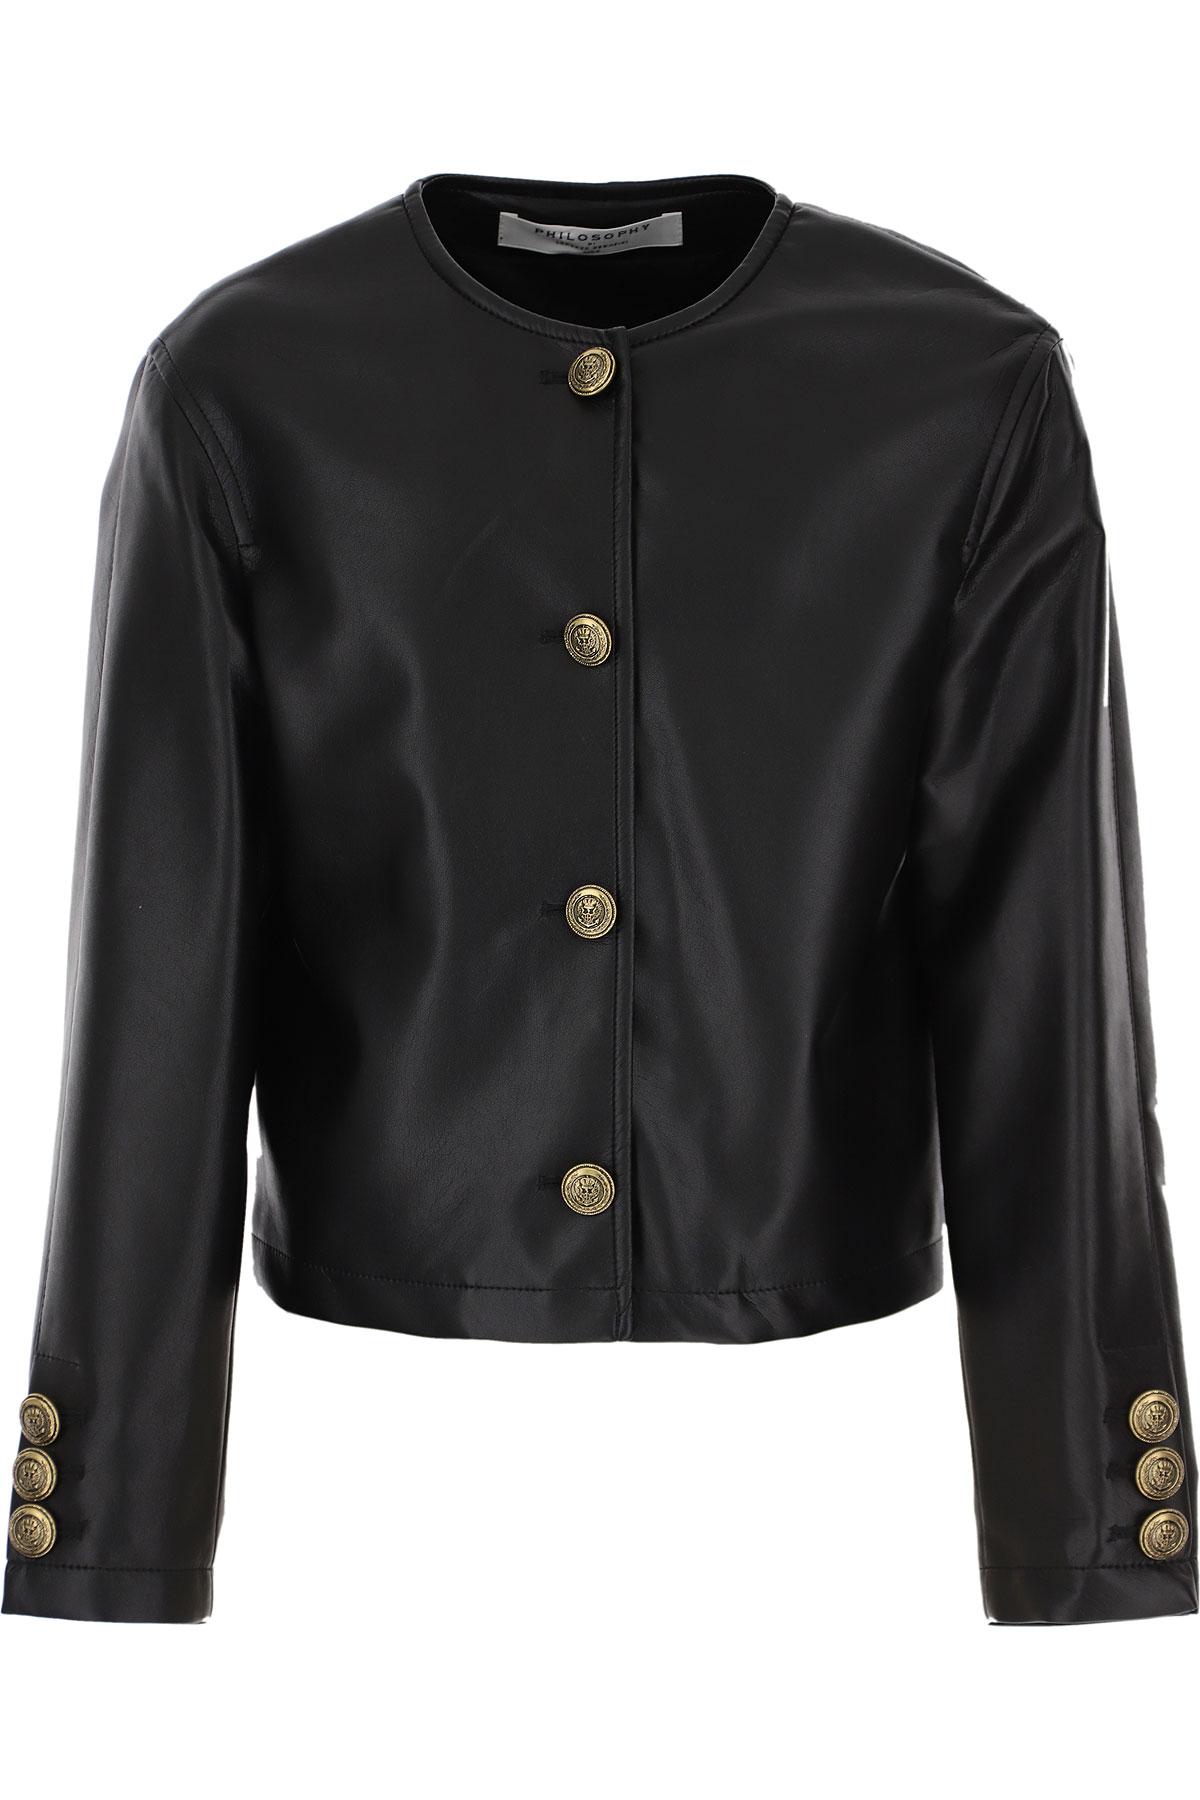 Philosophy di Lorenzo Serafini Kids Jacket for Girls On Sale, Black, polyurethane, 2019, L M XL